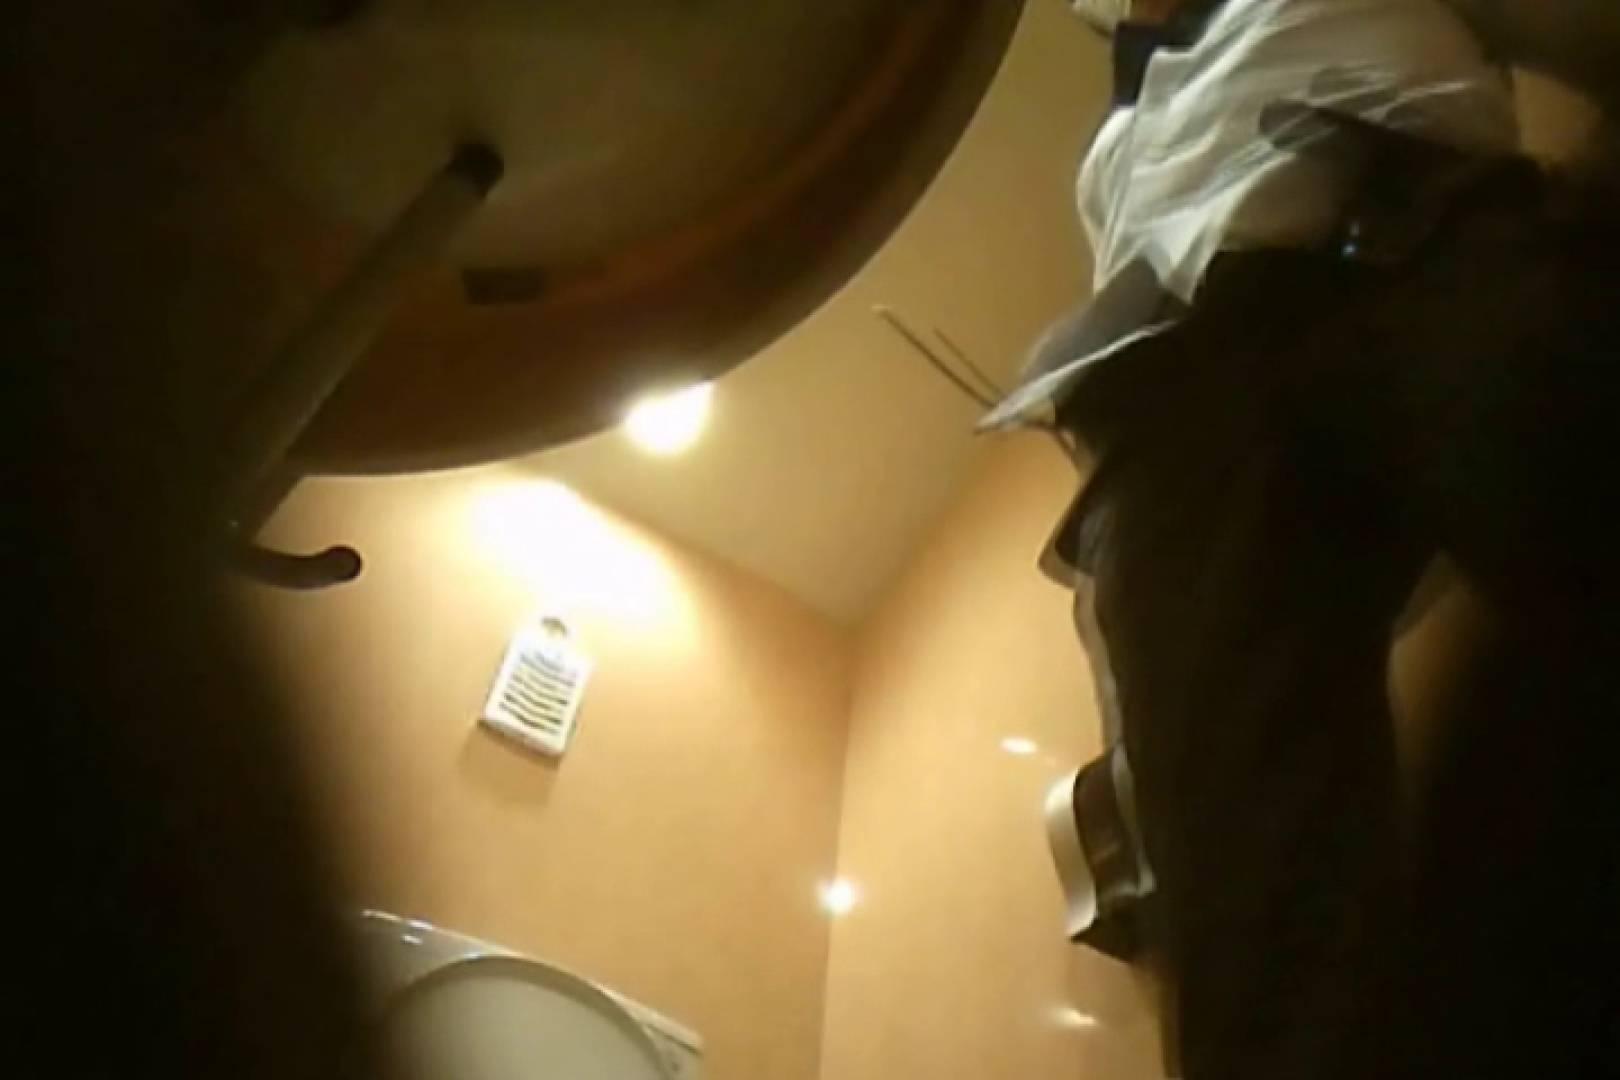 SEASON 3rd!掴み取りさんの洗面所覗き!in新幹線!VOL.02 スーツボーイズ | のぞき  102pic 101